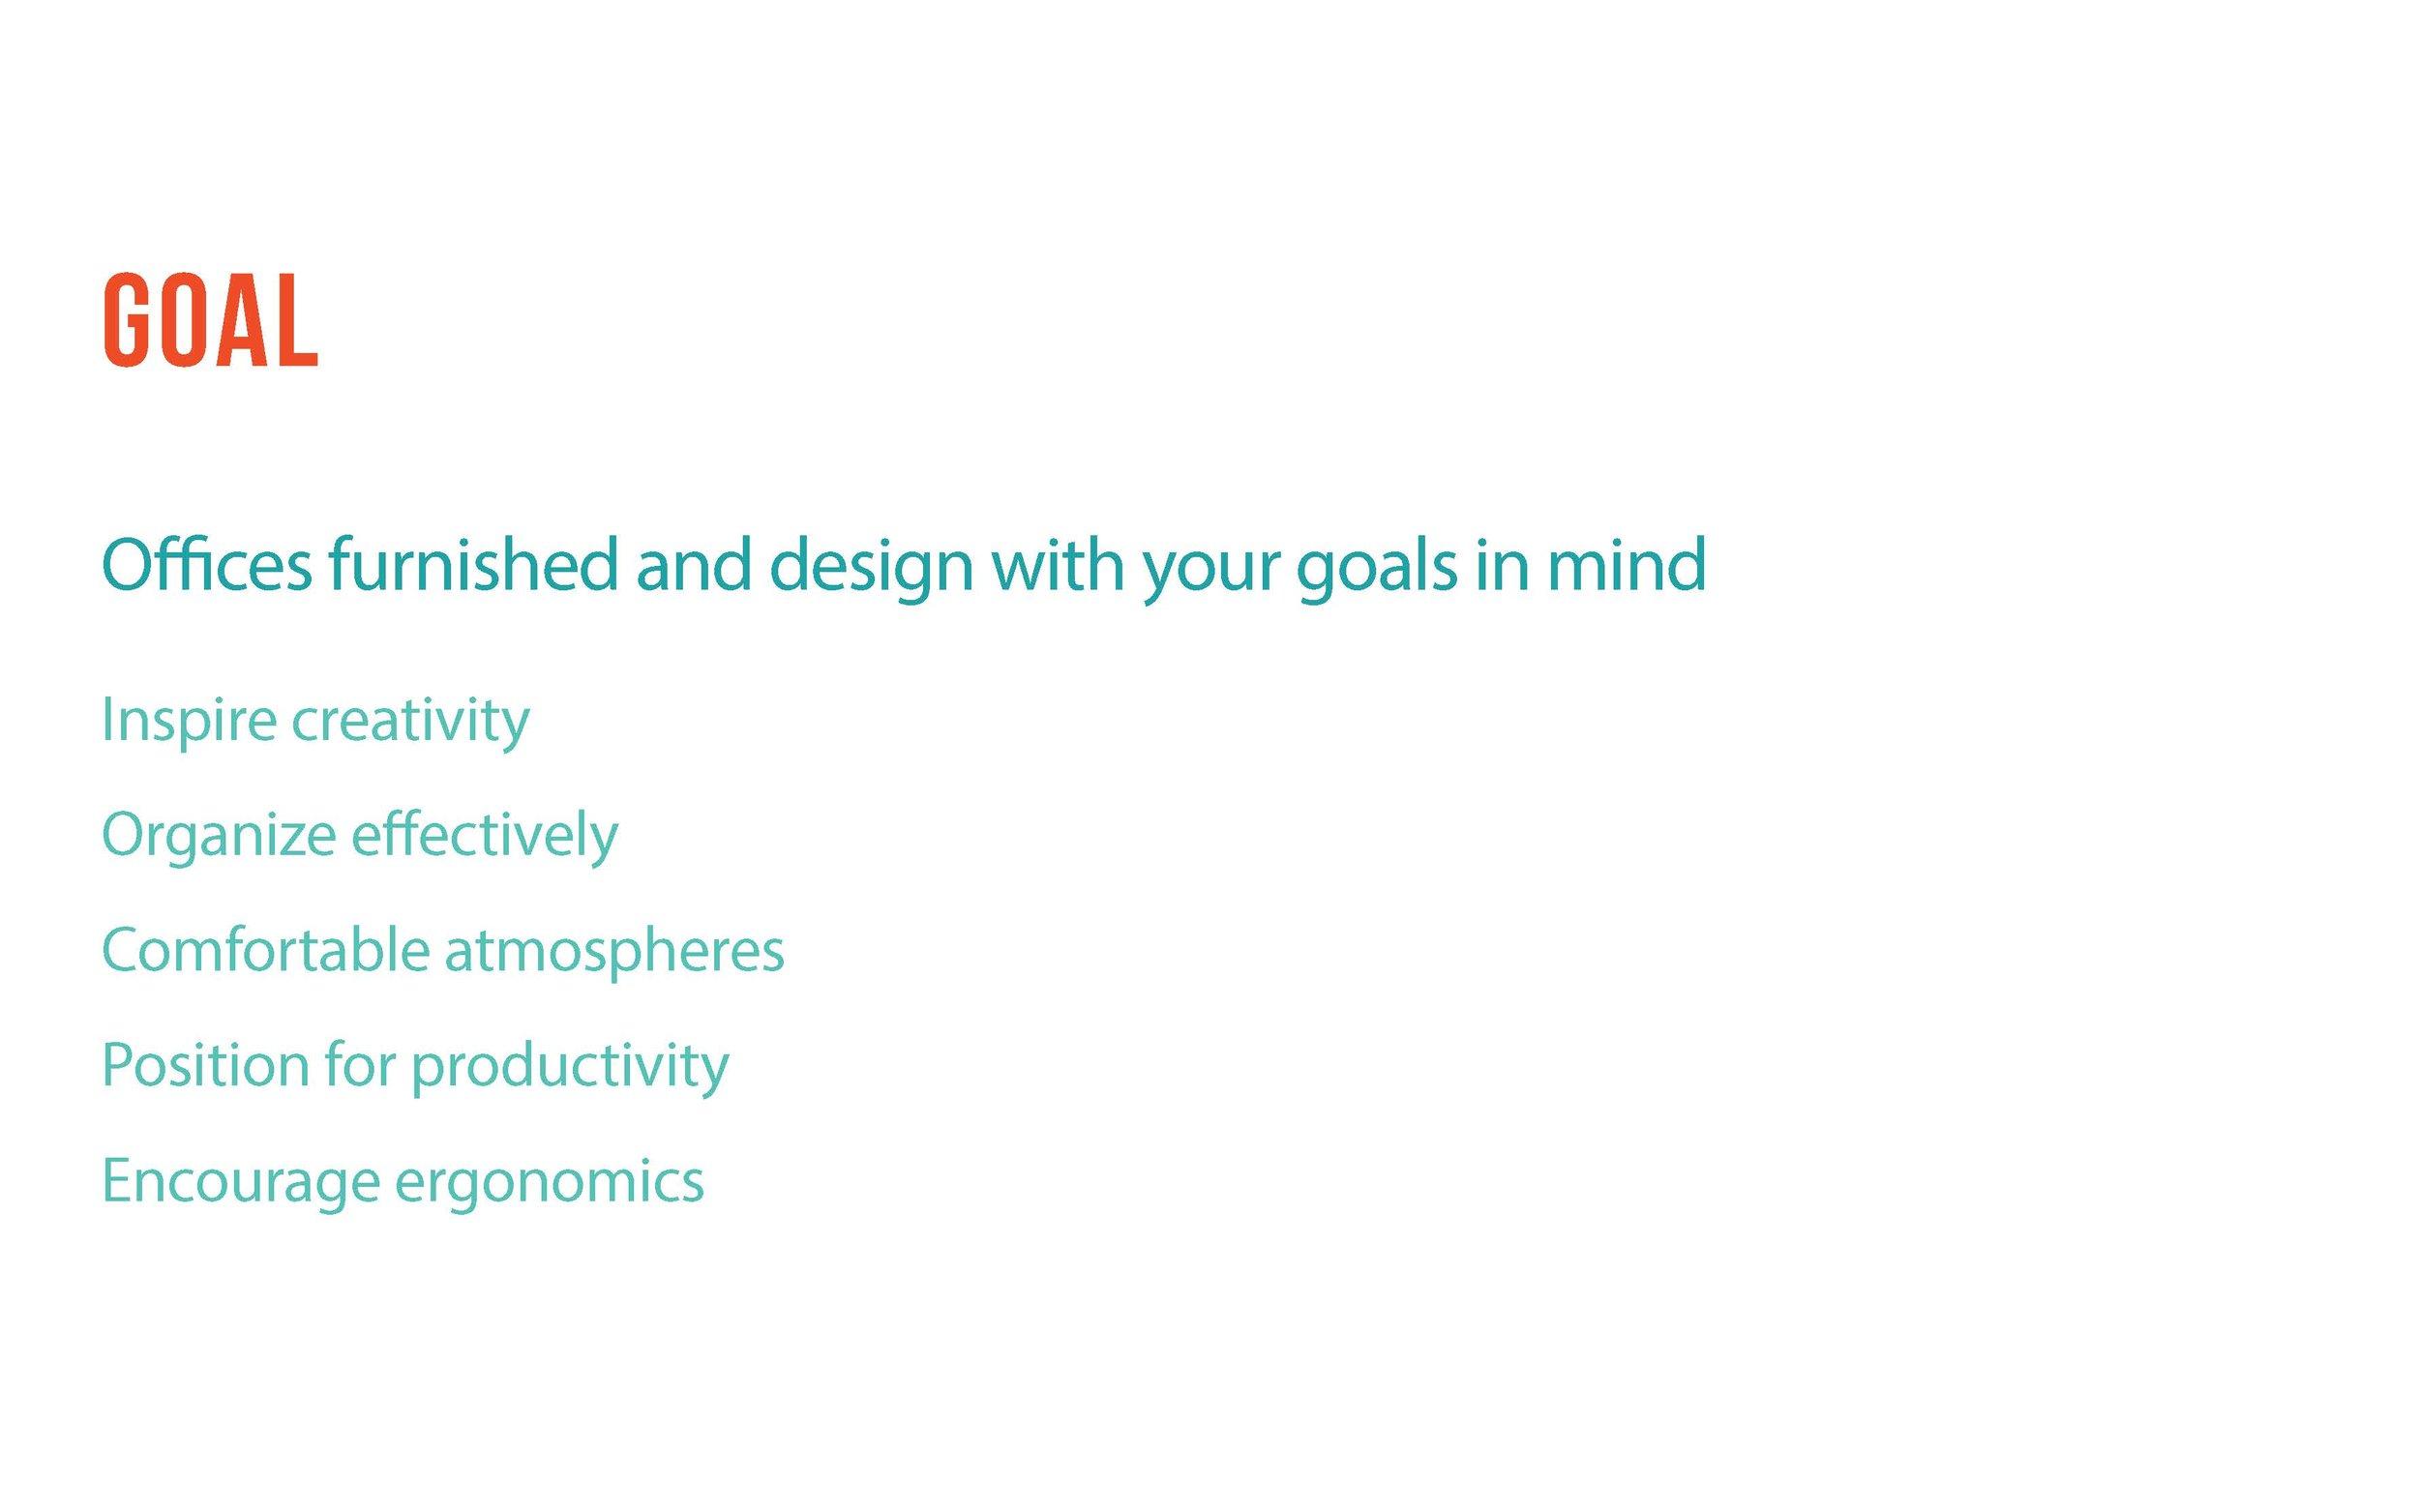 blkbrn-moodboard-presentation-v3_Page_3.jpg